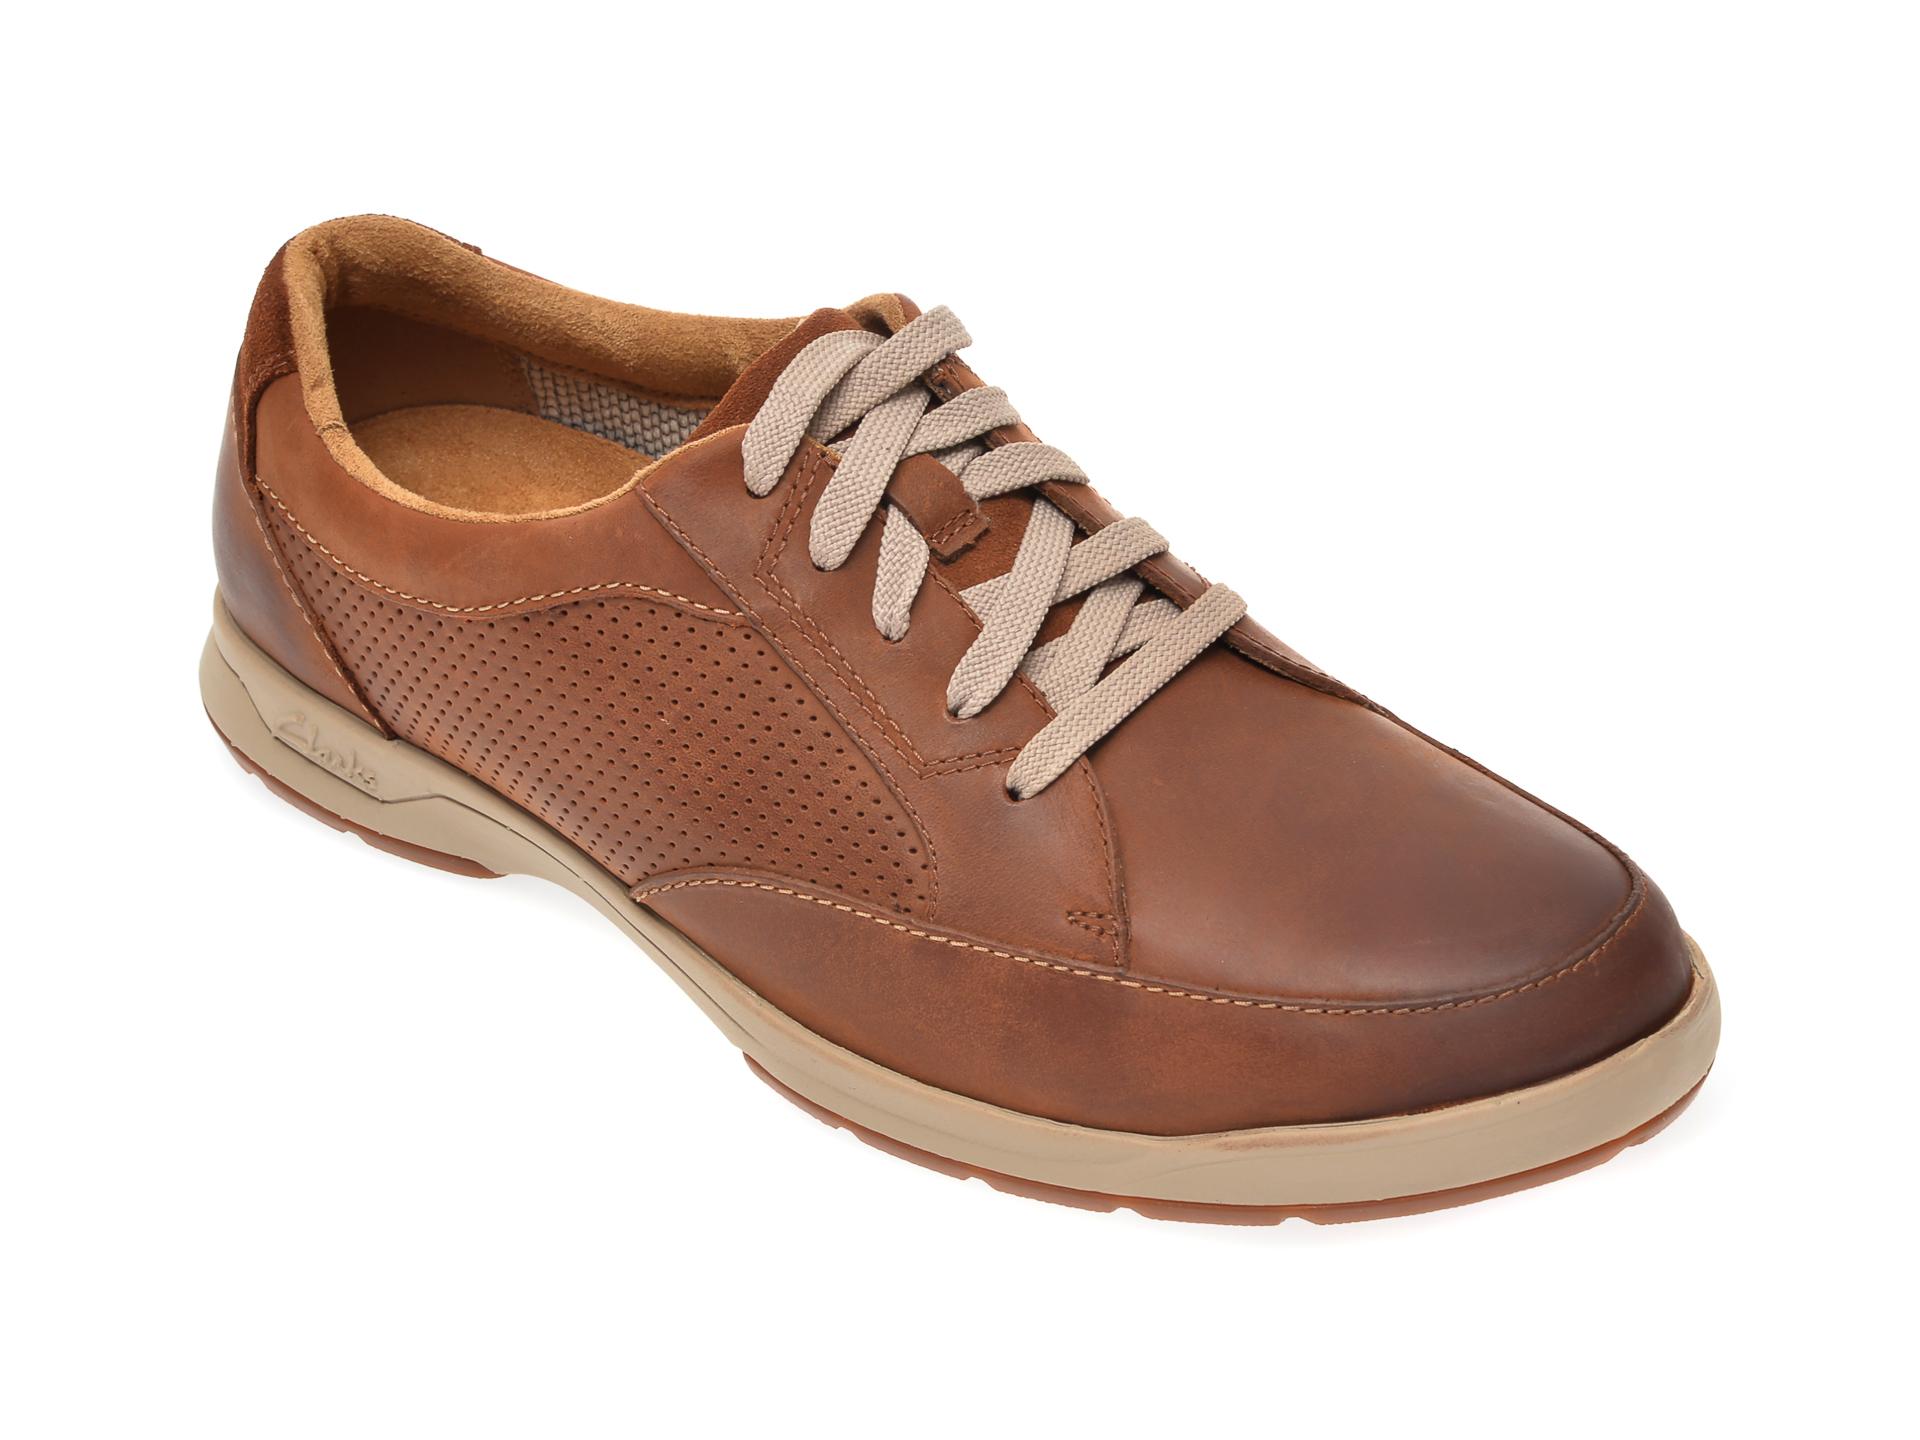 Pantofi CLARKS maro, Stafford Park5, din piele naturala